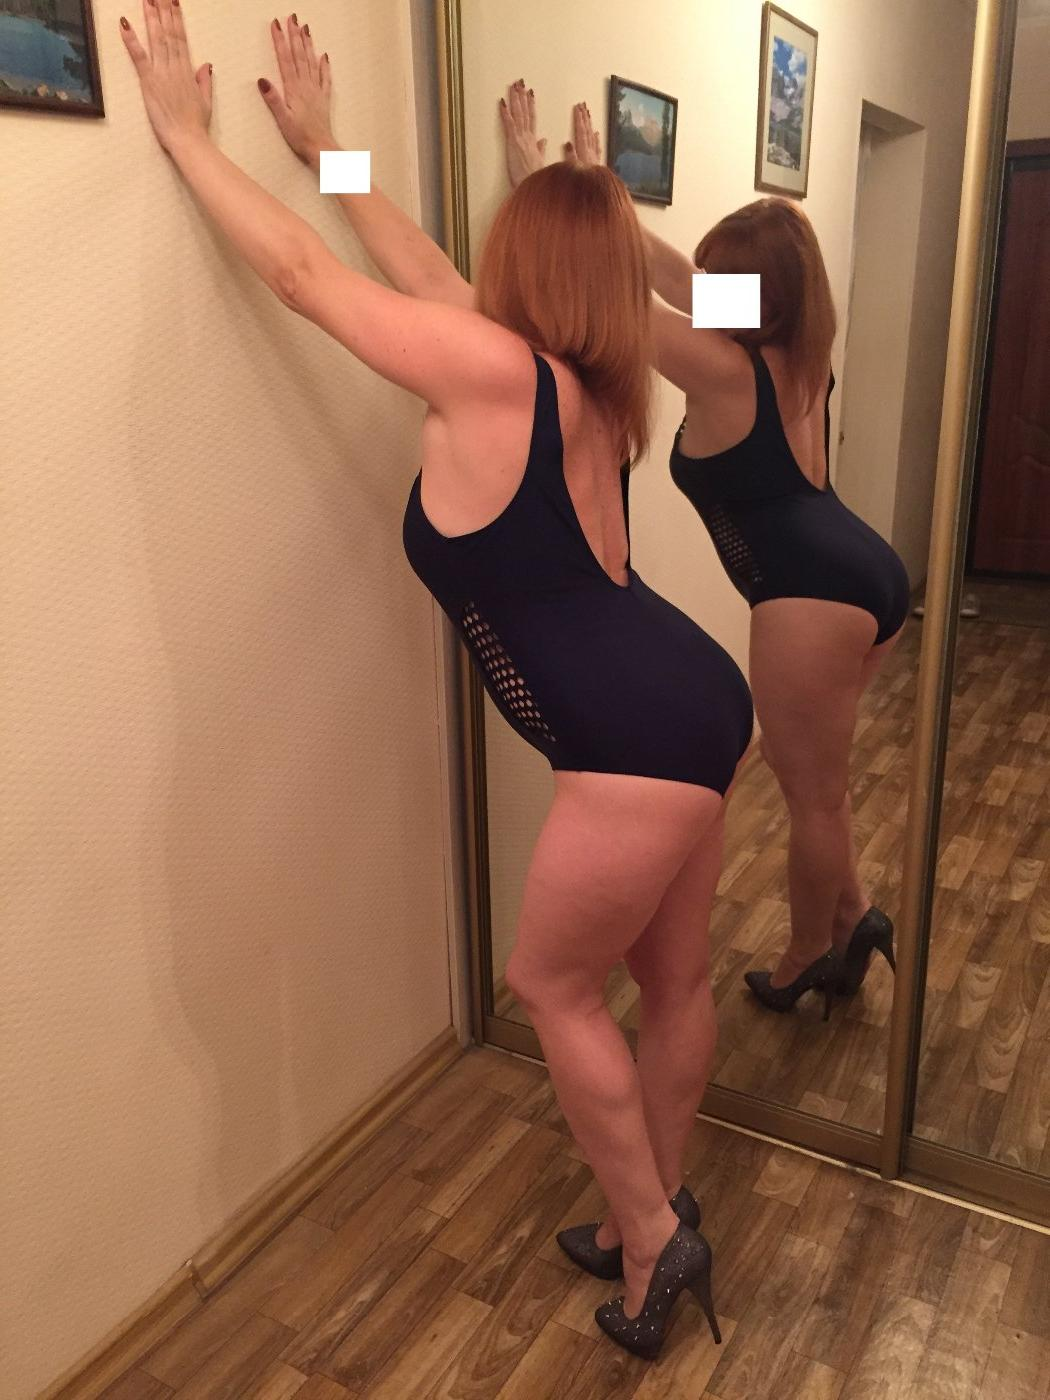 Индивидуалка Ариша, 23 года, метро Арбатская